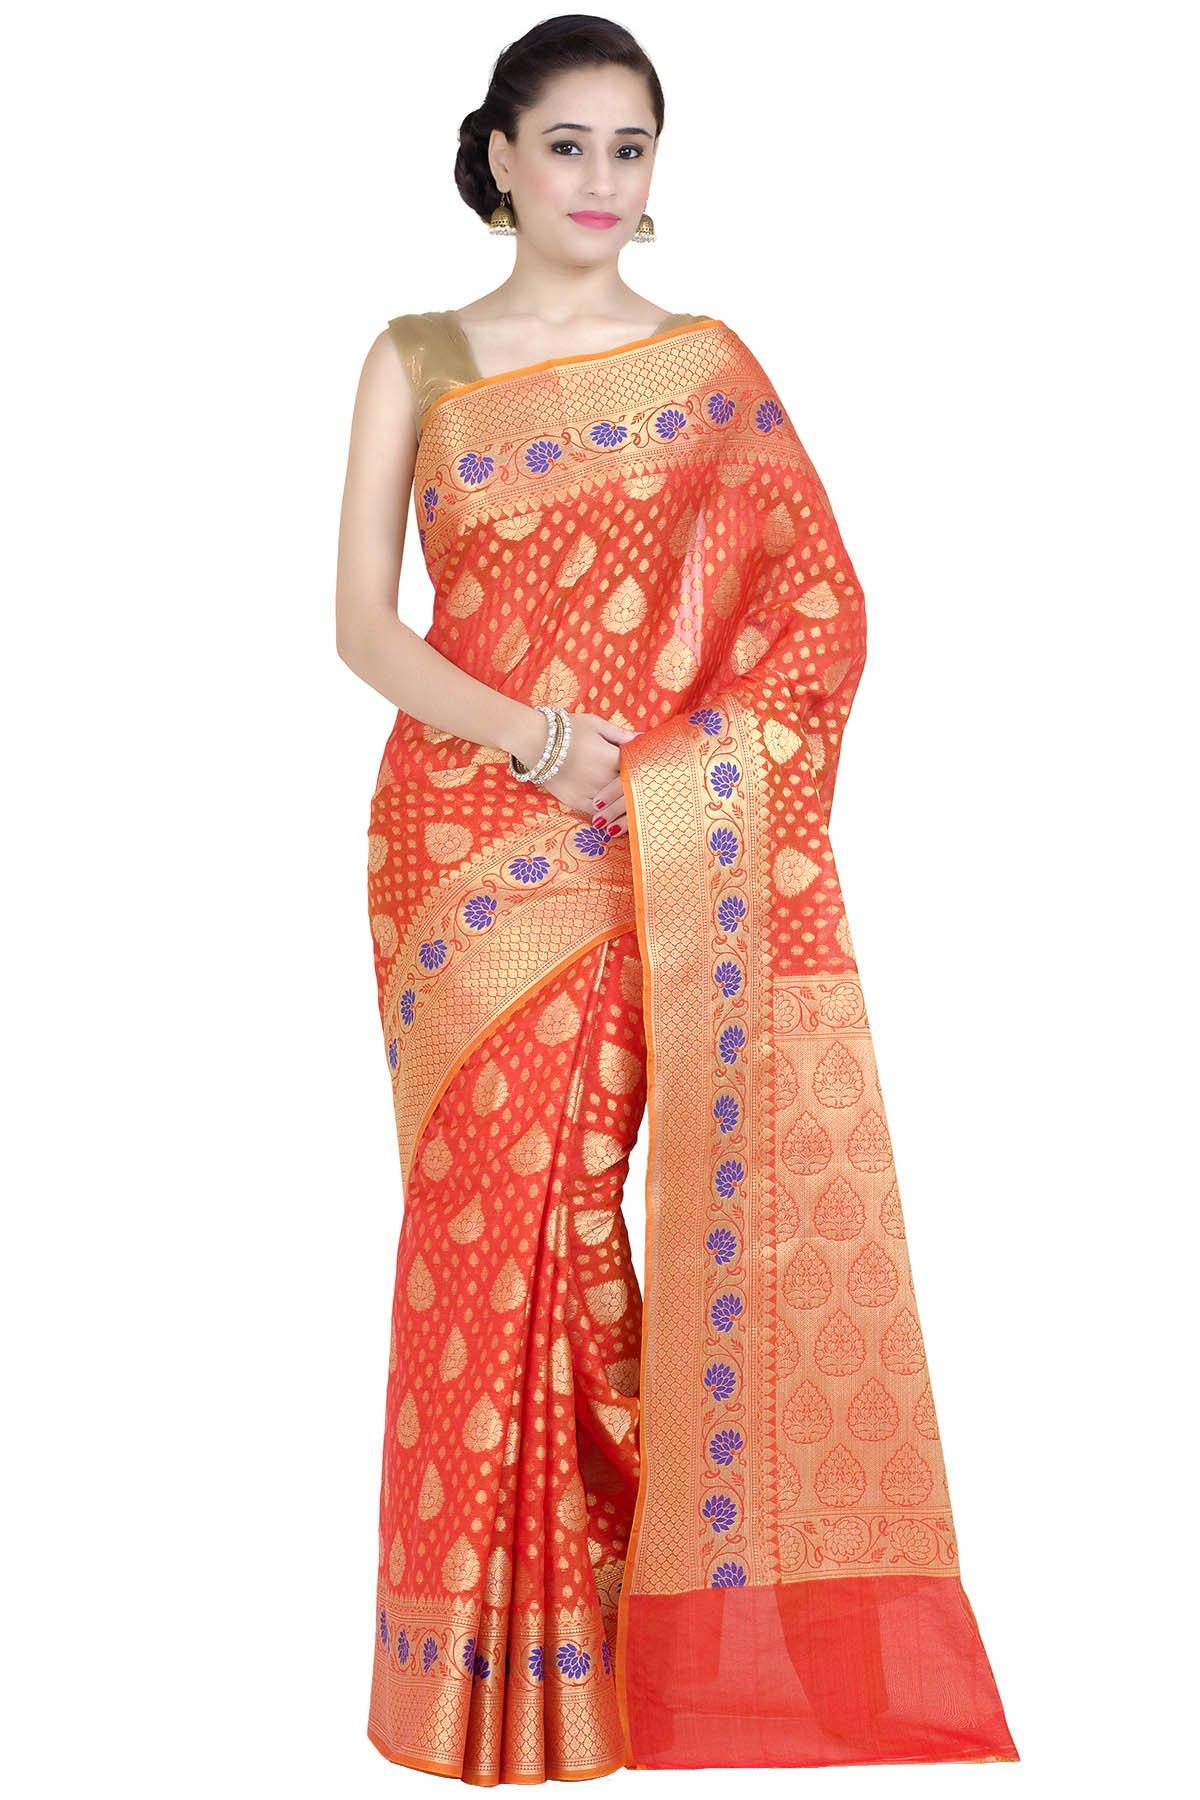 Chandrakala Women's Orange Cotton Silk Banarasi Saree(1267ORA)